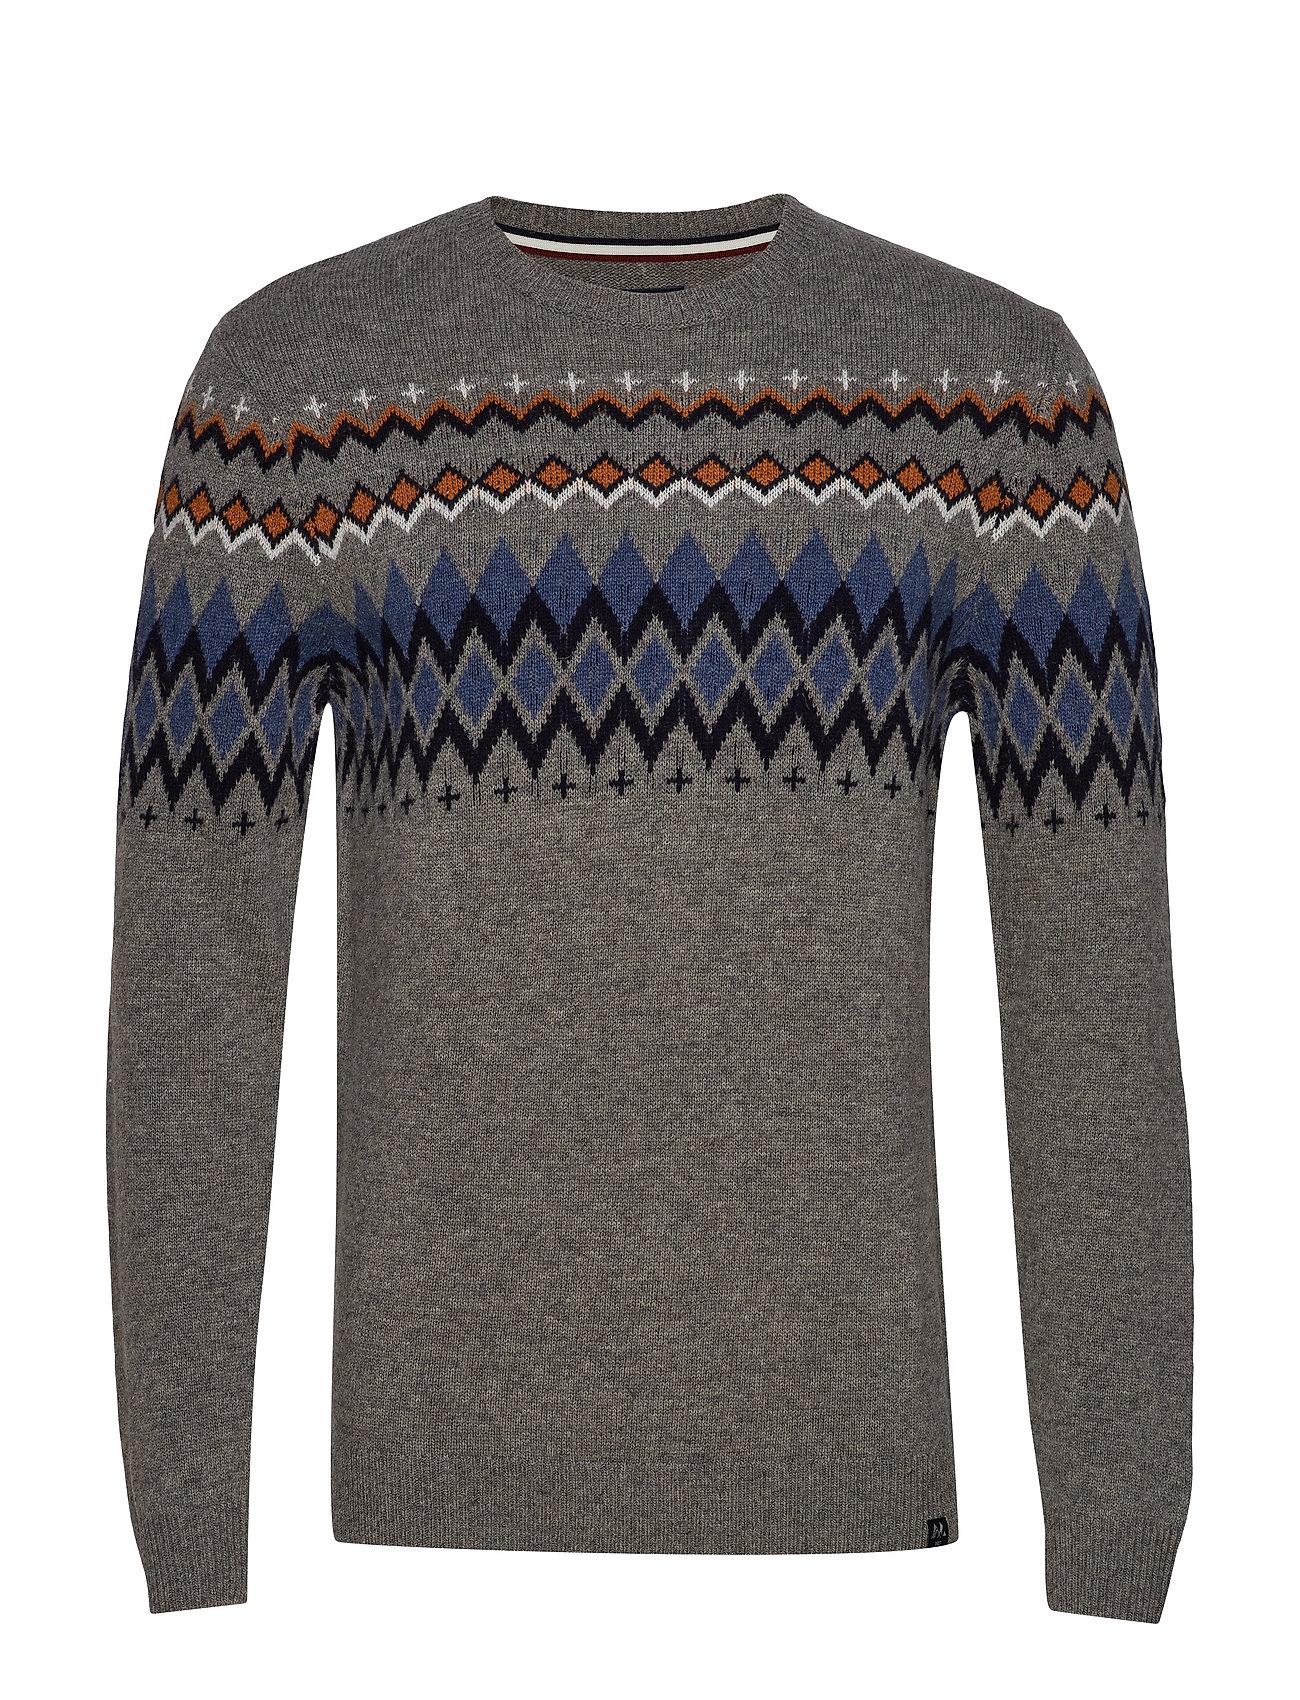 Lindbergh Lambswool jacquard knit - GREY MEL